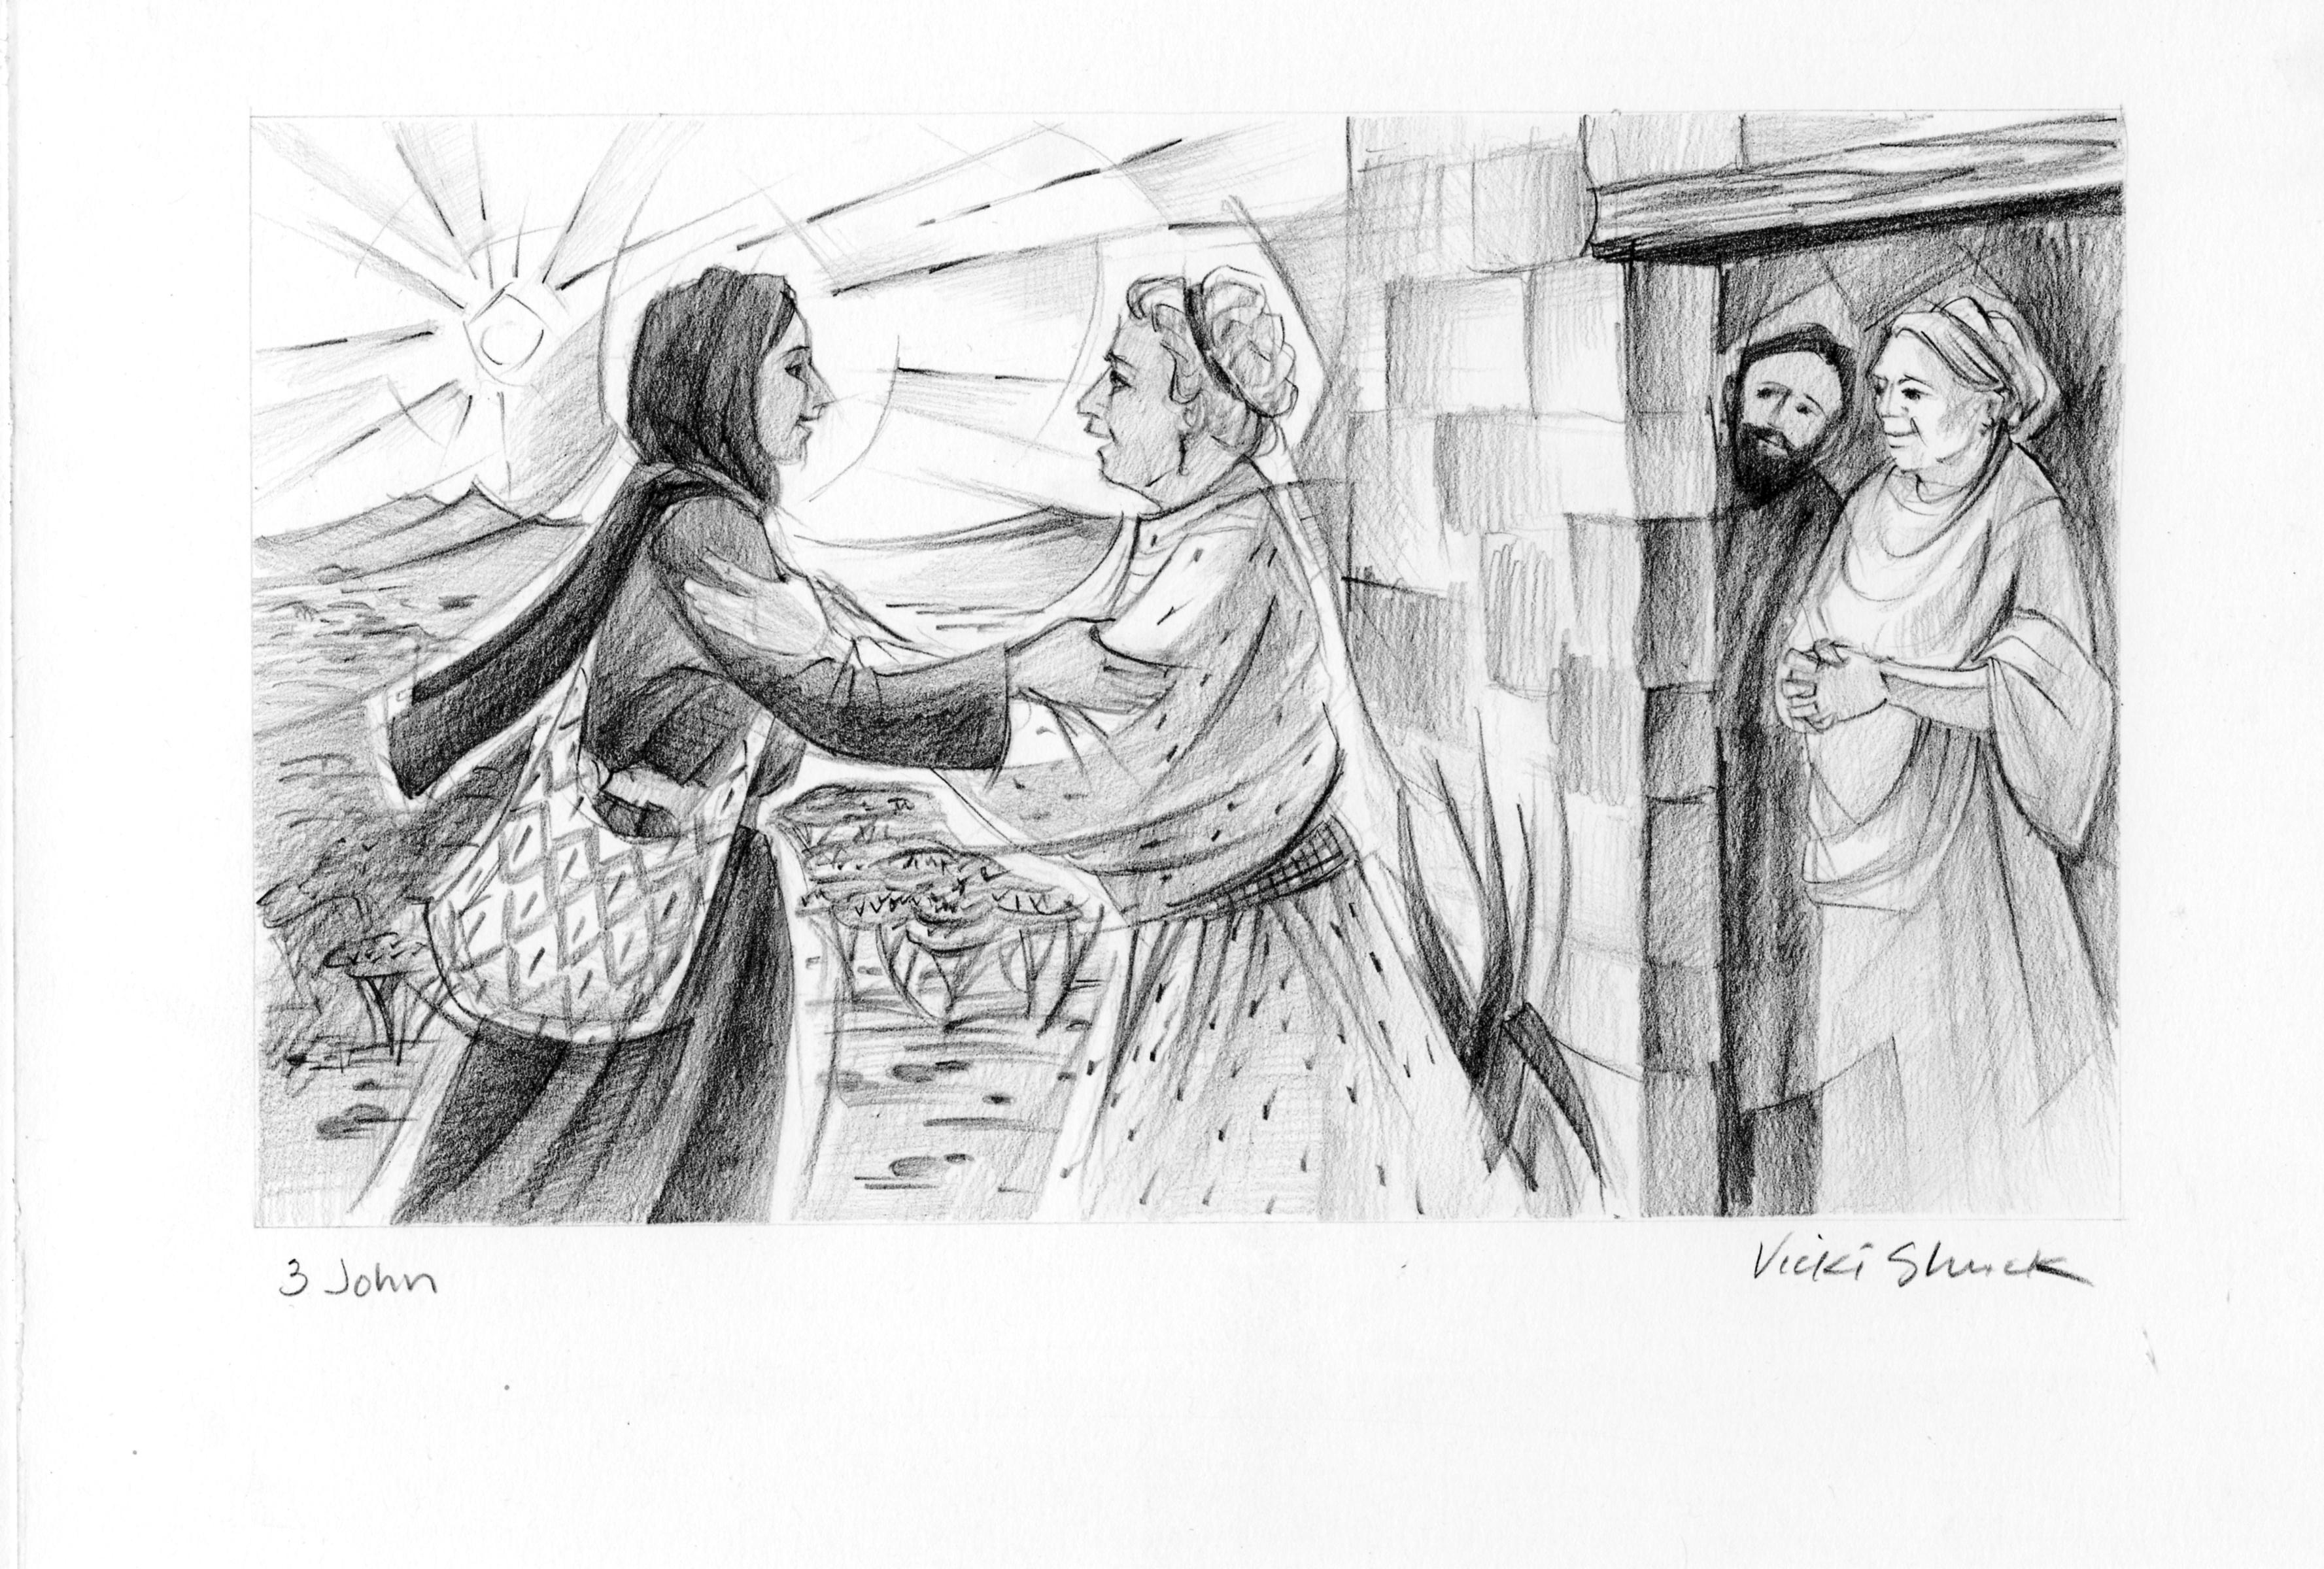 3 John Illustration